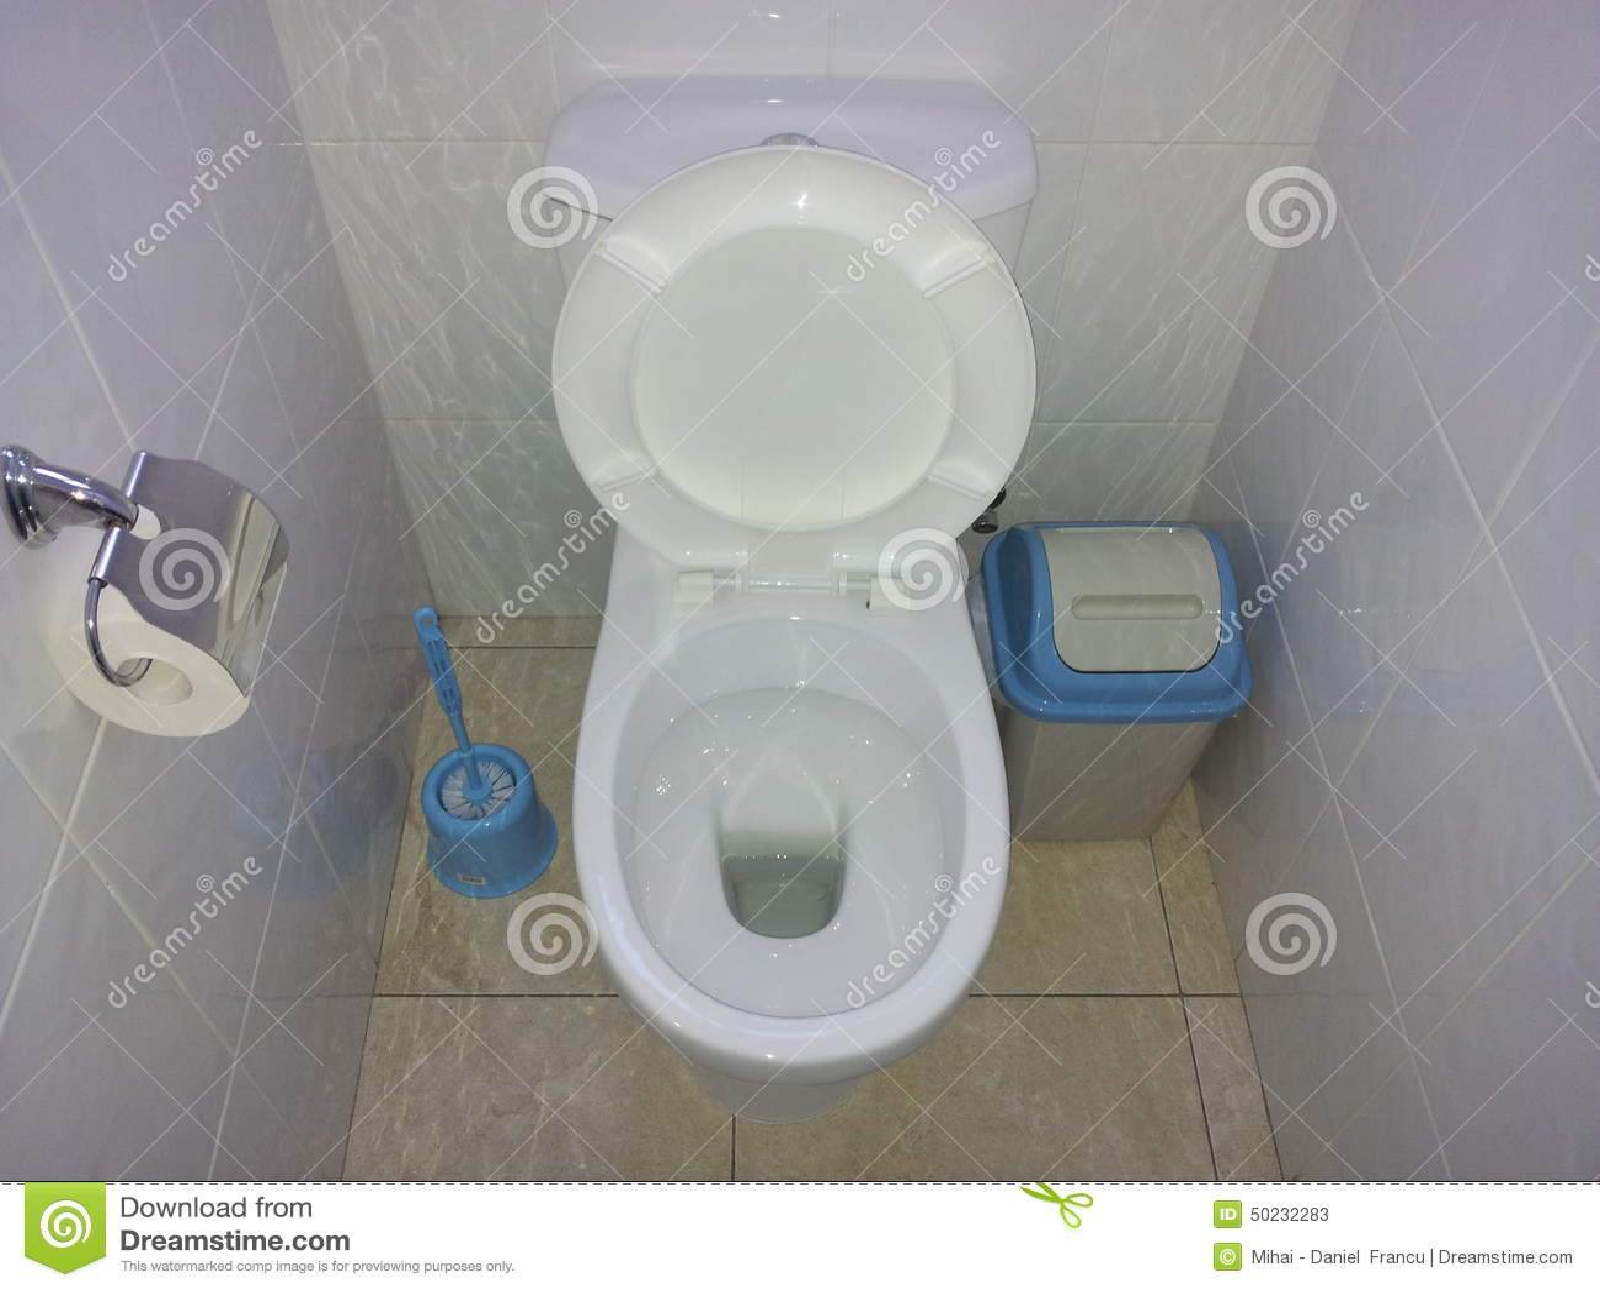 Toilet Seat Woman